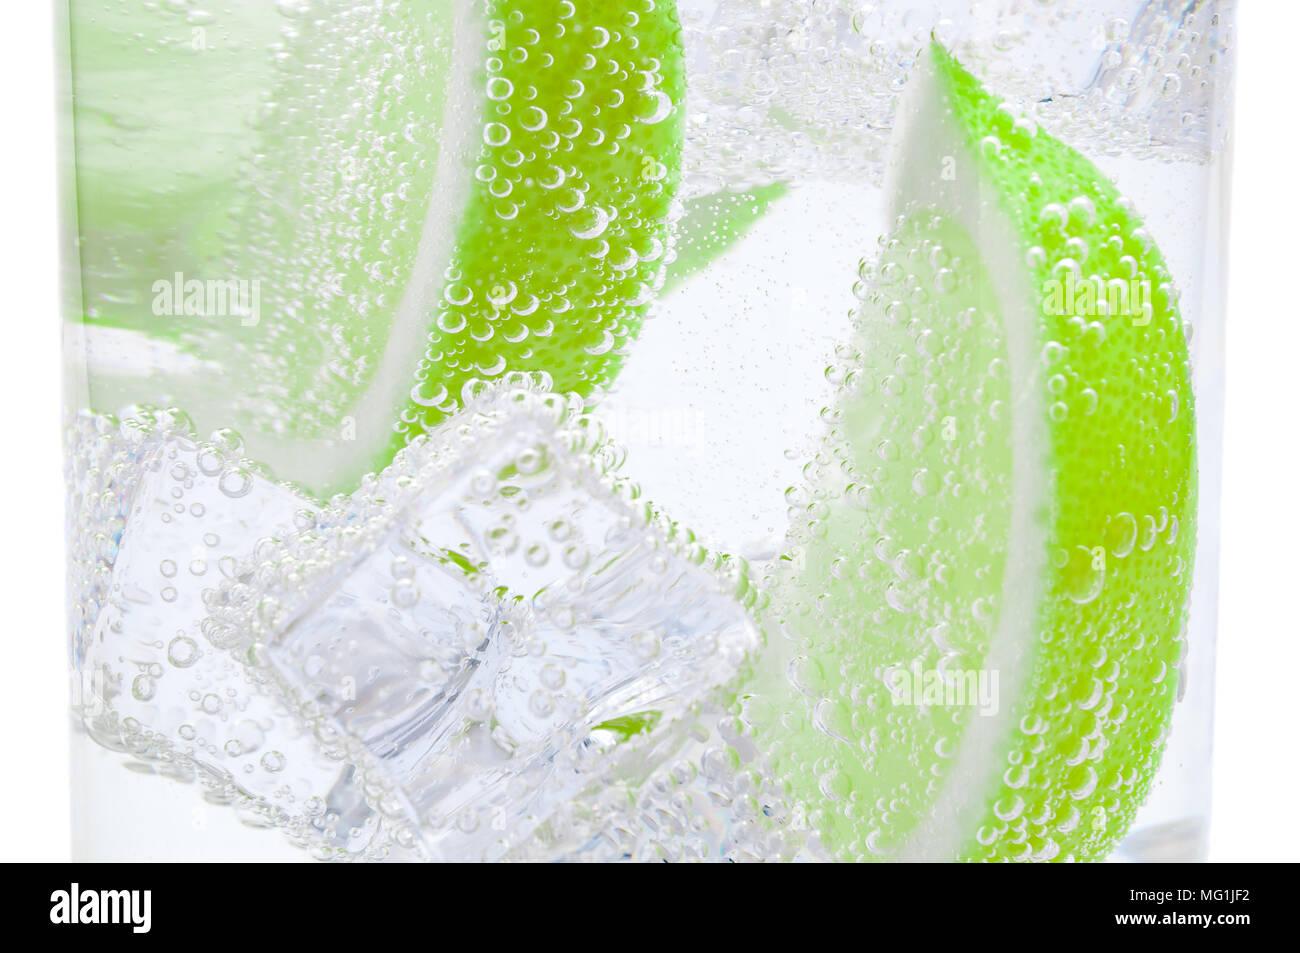 Trozos de limón jugoso fresco se hunden en el agua cristalina. Foto de stock